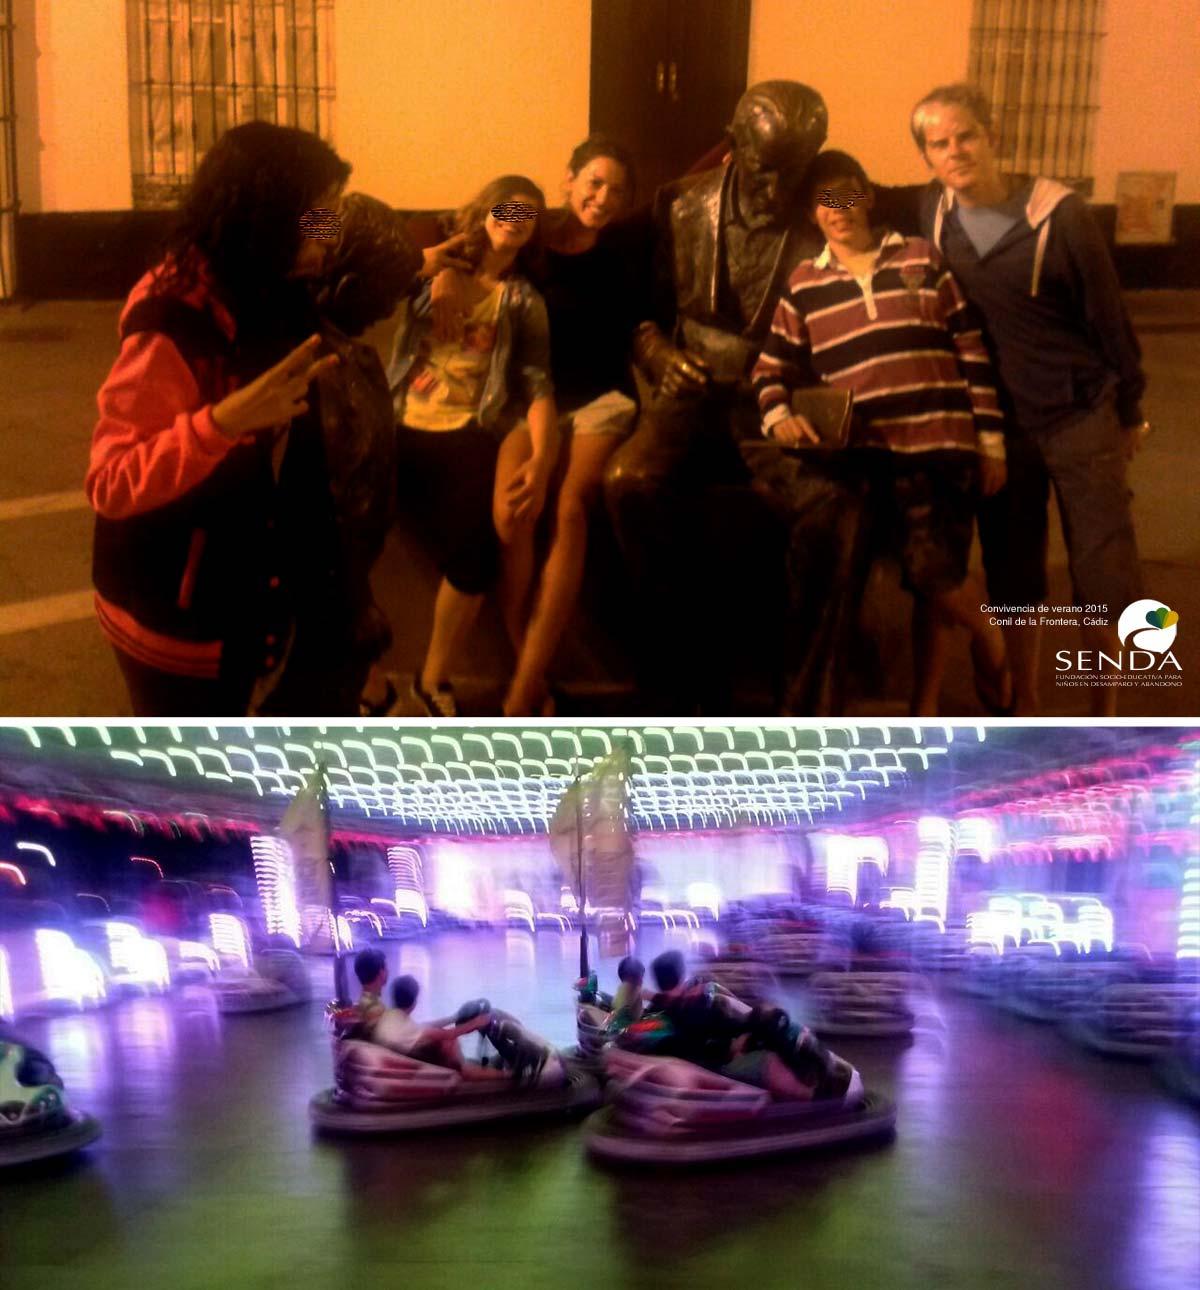 fundacion-senda-andalucia-convivencia-verano-vejer-de-la-frontera-2015